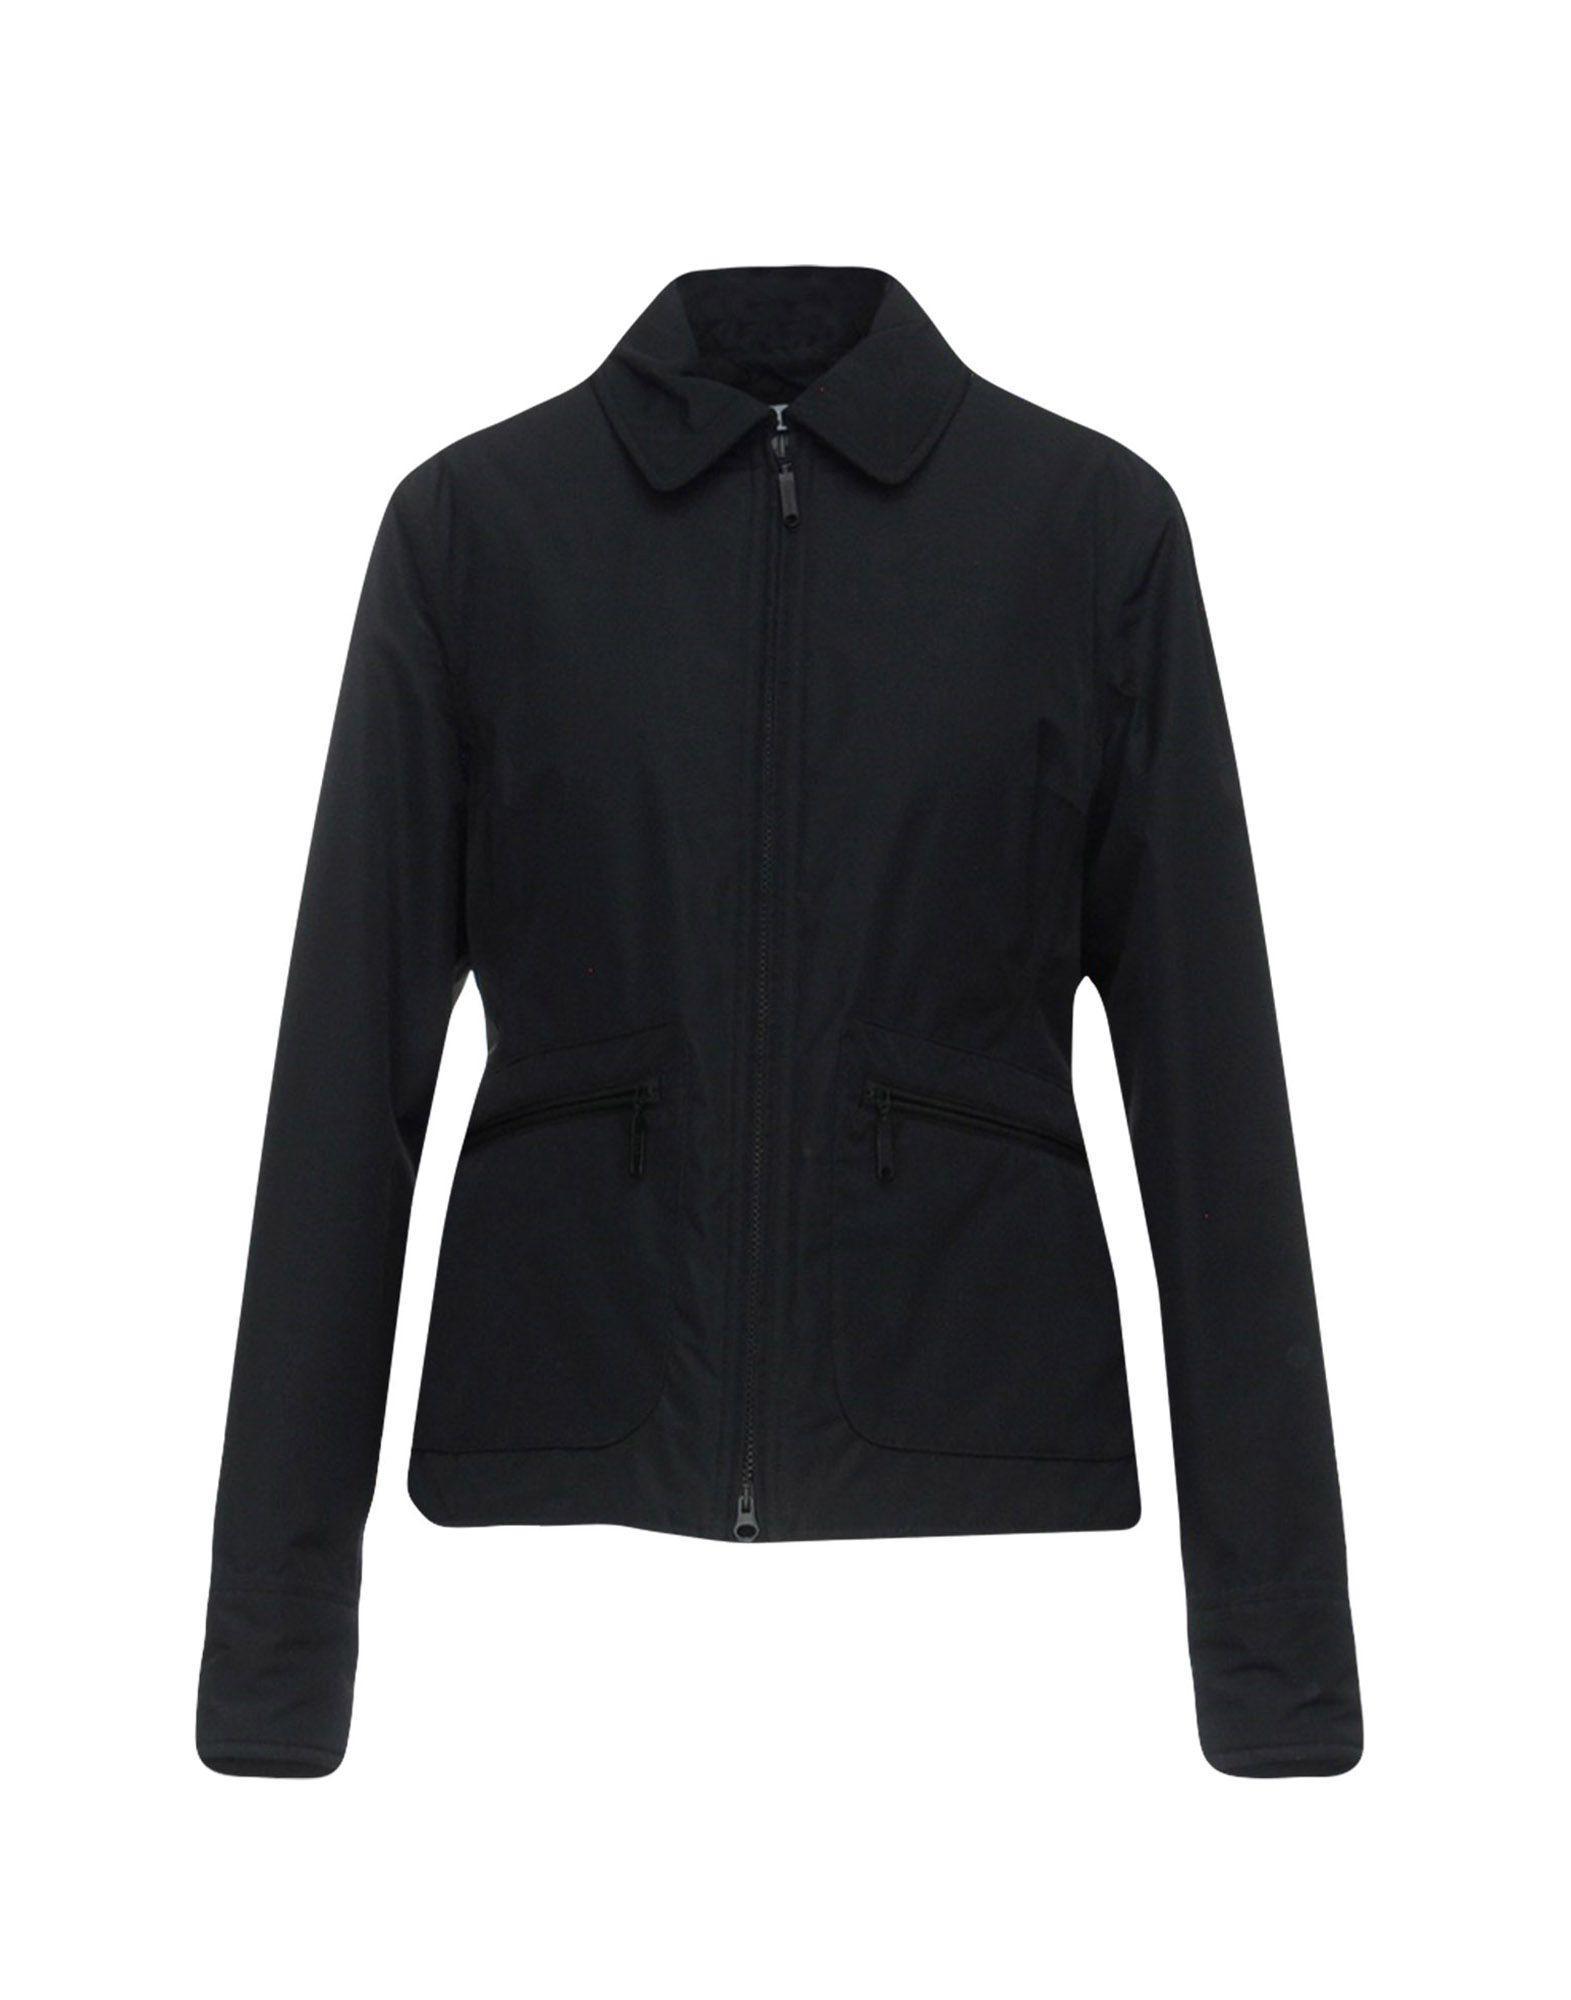 Aspesi Jacket In Black